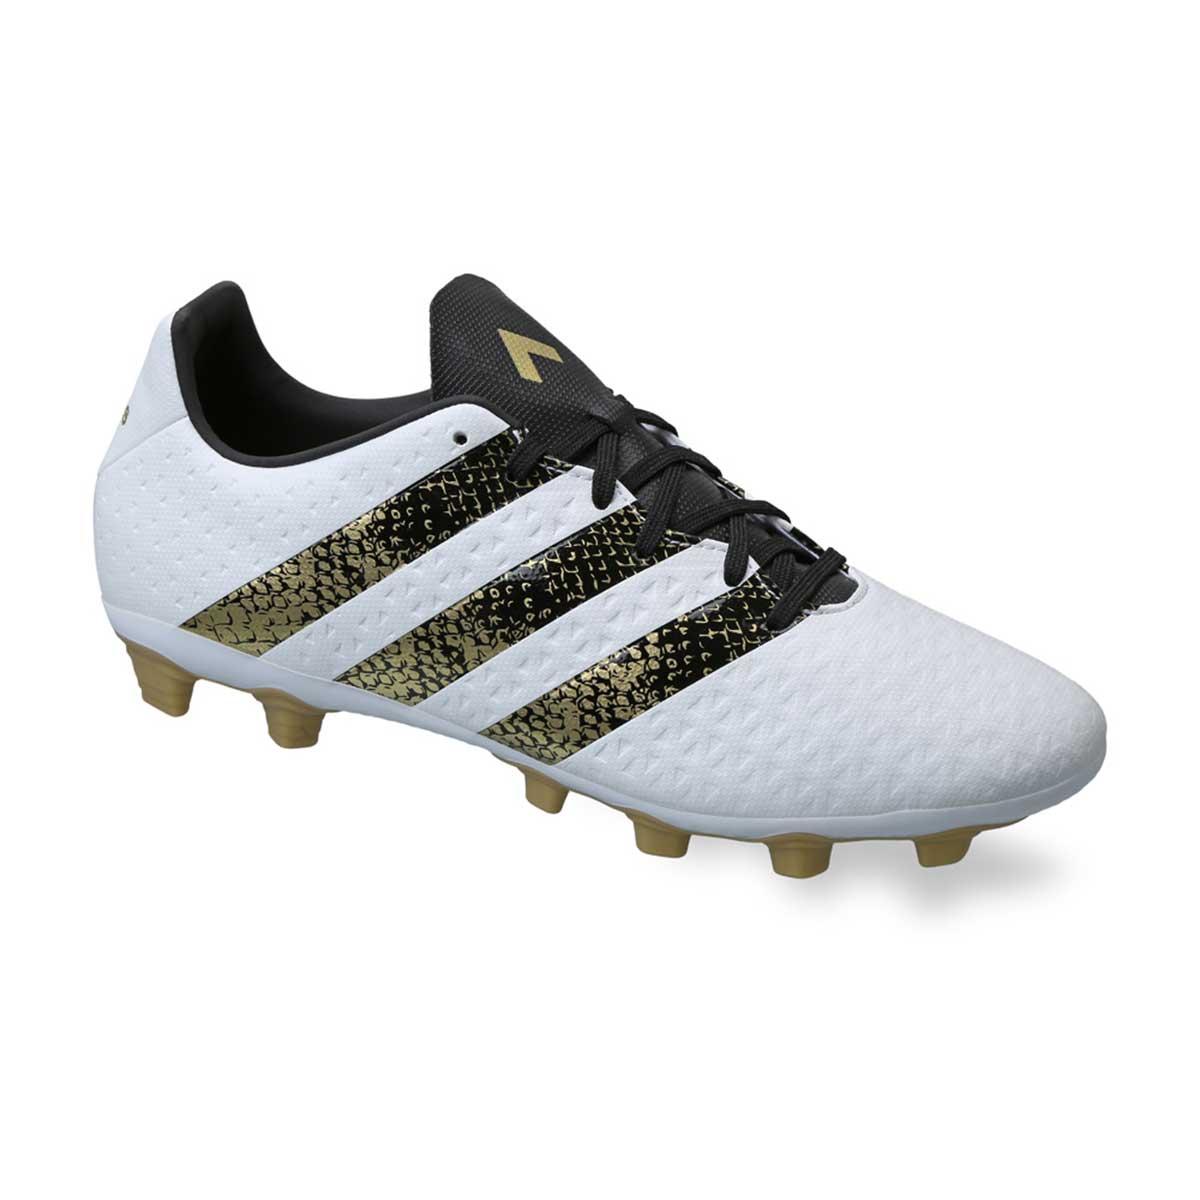 Buy Adidas Ace 16 4 Fxg Football Shoes White Black Gold